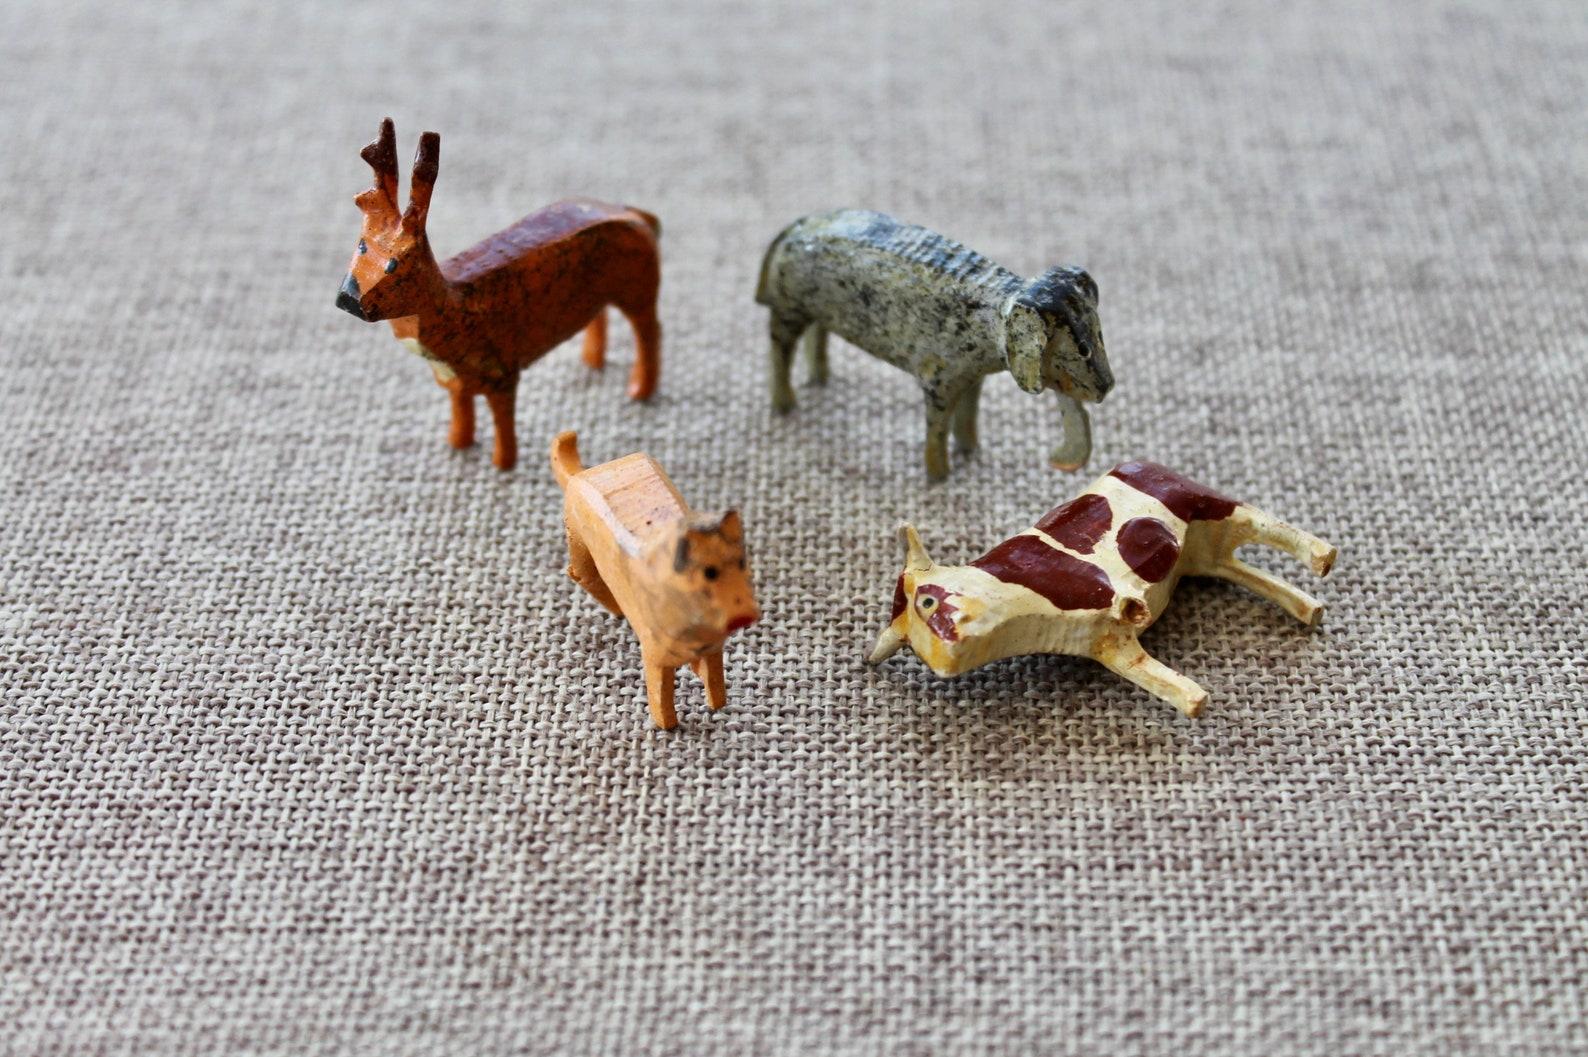 Vintage 4 Wooden German Erzgebirge Animals - Larger Scale Size, Vintage Painted Wood Animal Miniatures - Cow, Cat, Deer, Elephan